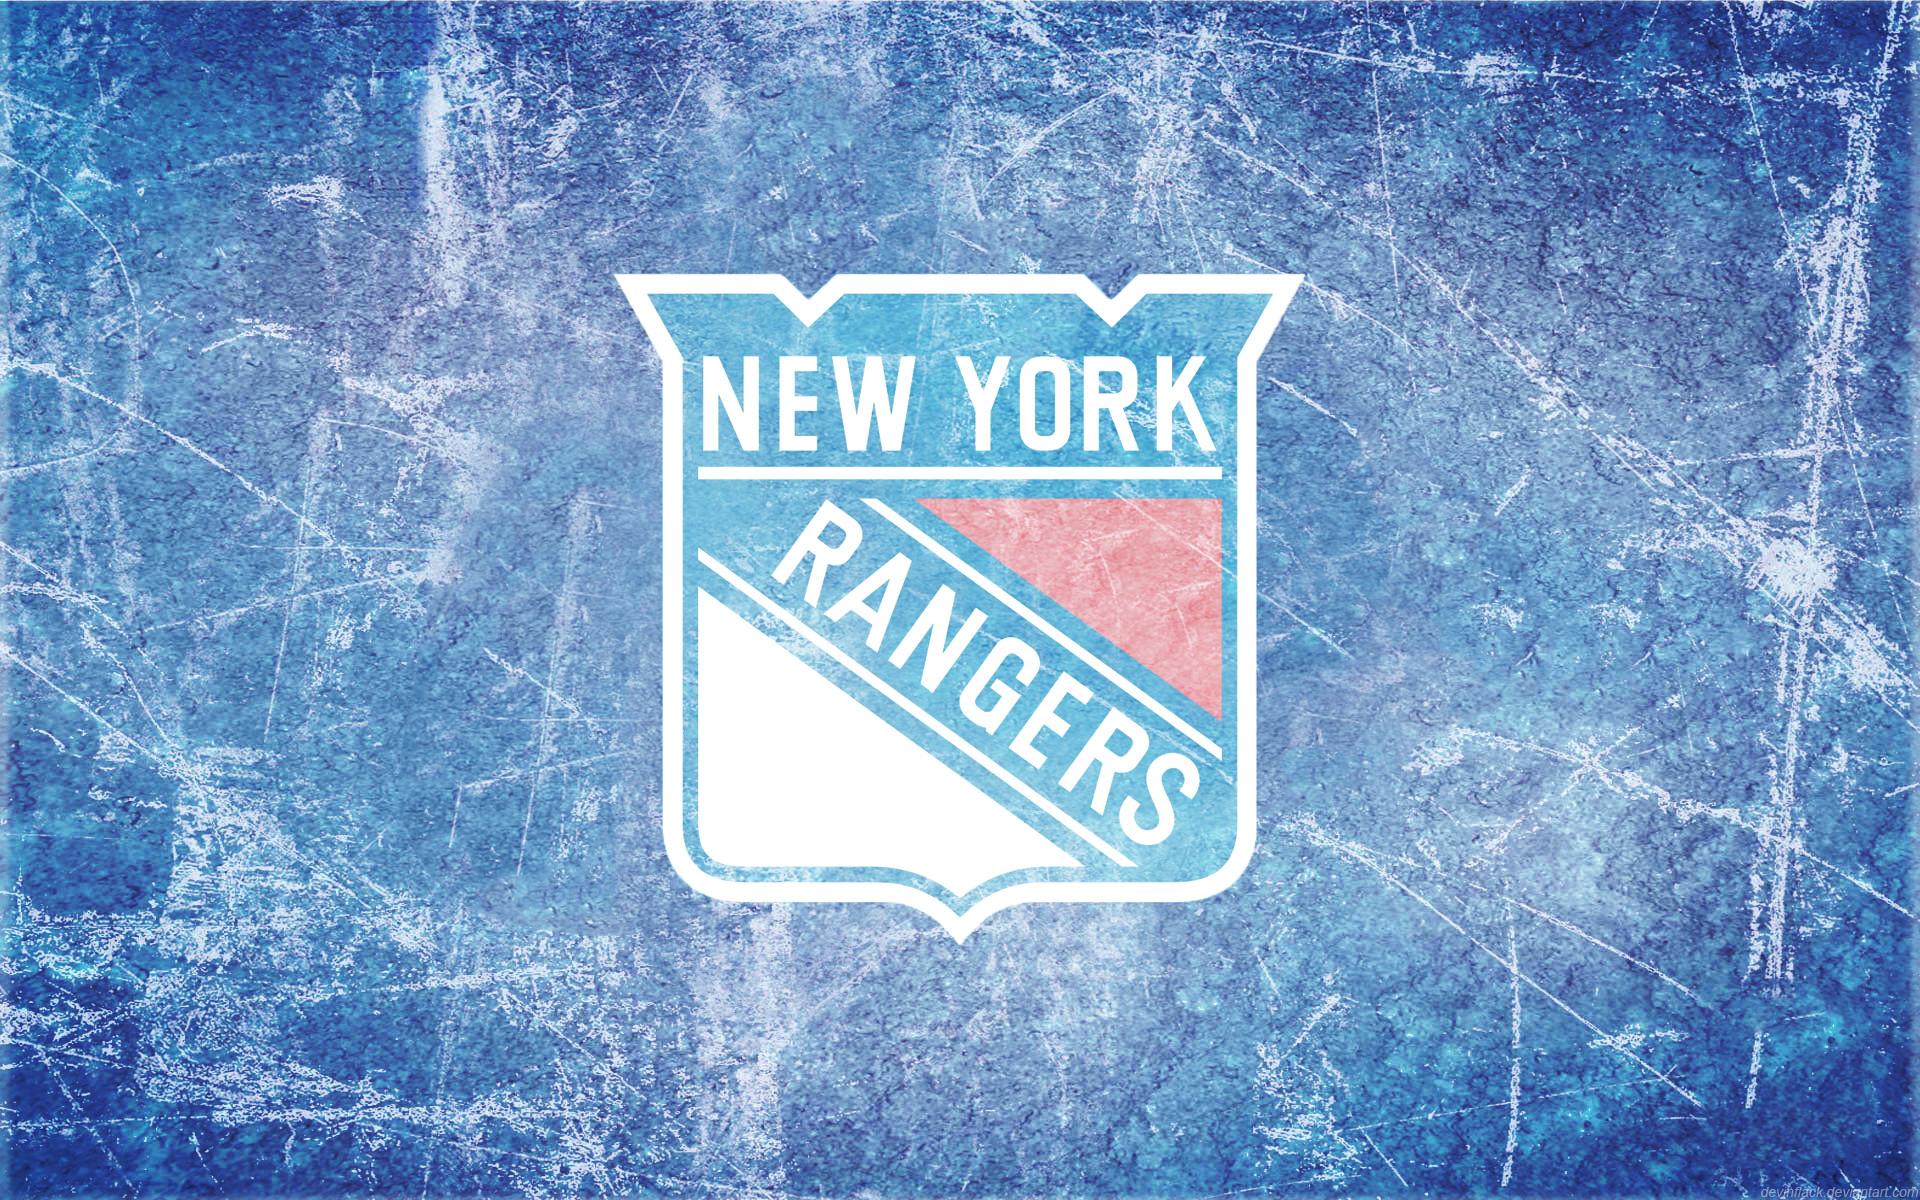 NHL New York Rangers Hockey Player Henrik Ludqvist wallpaper HD …    Download Wallpaper   Pinterest   Rangers hockey, Hockey and Henrik lundqvist